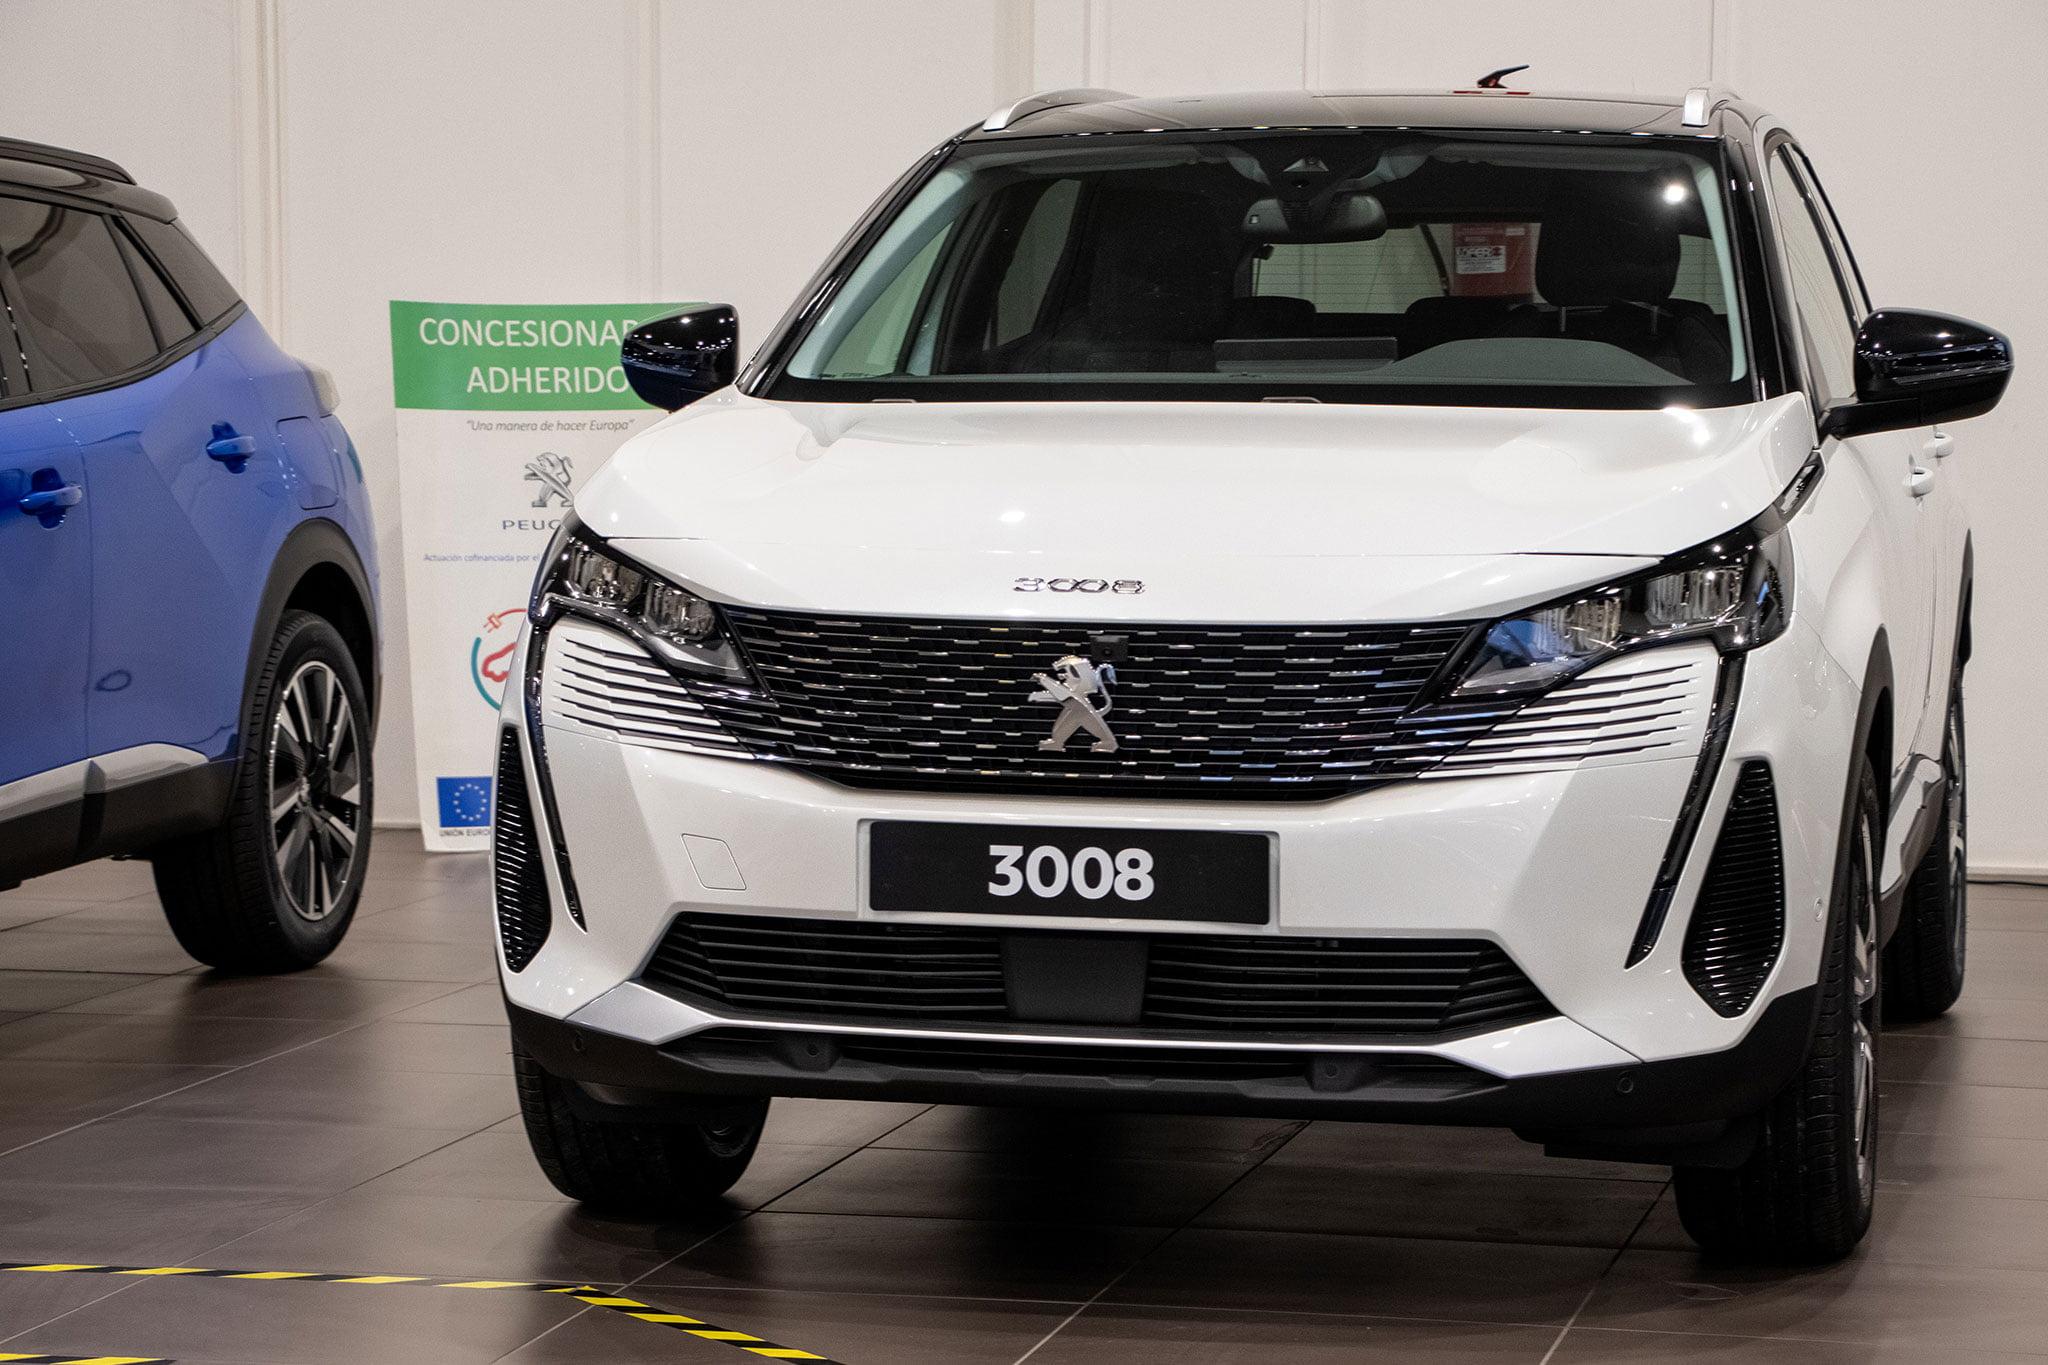 Nuevo modelo de Peugeot 3008 – Peumóvil